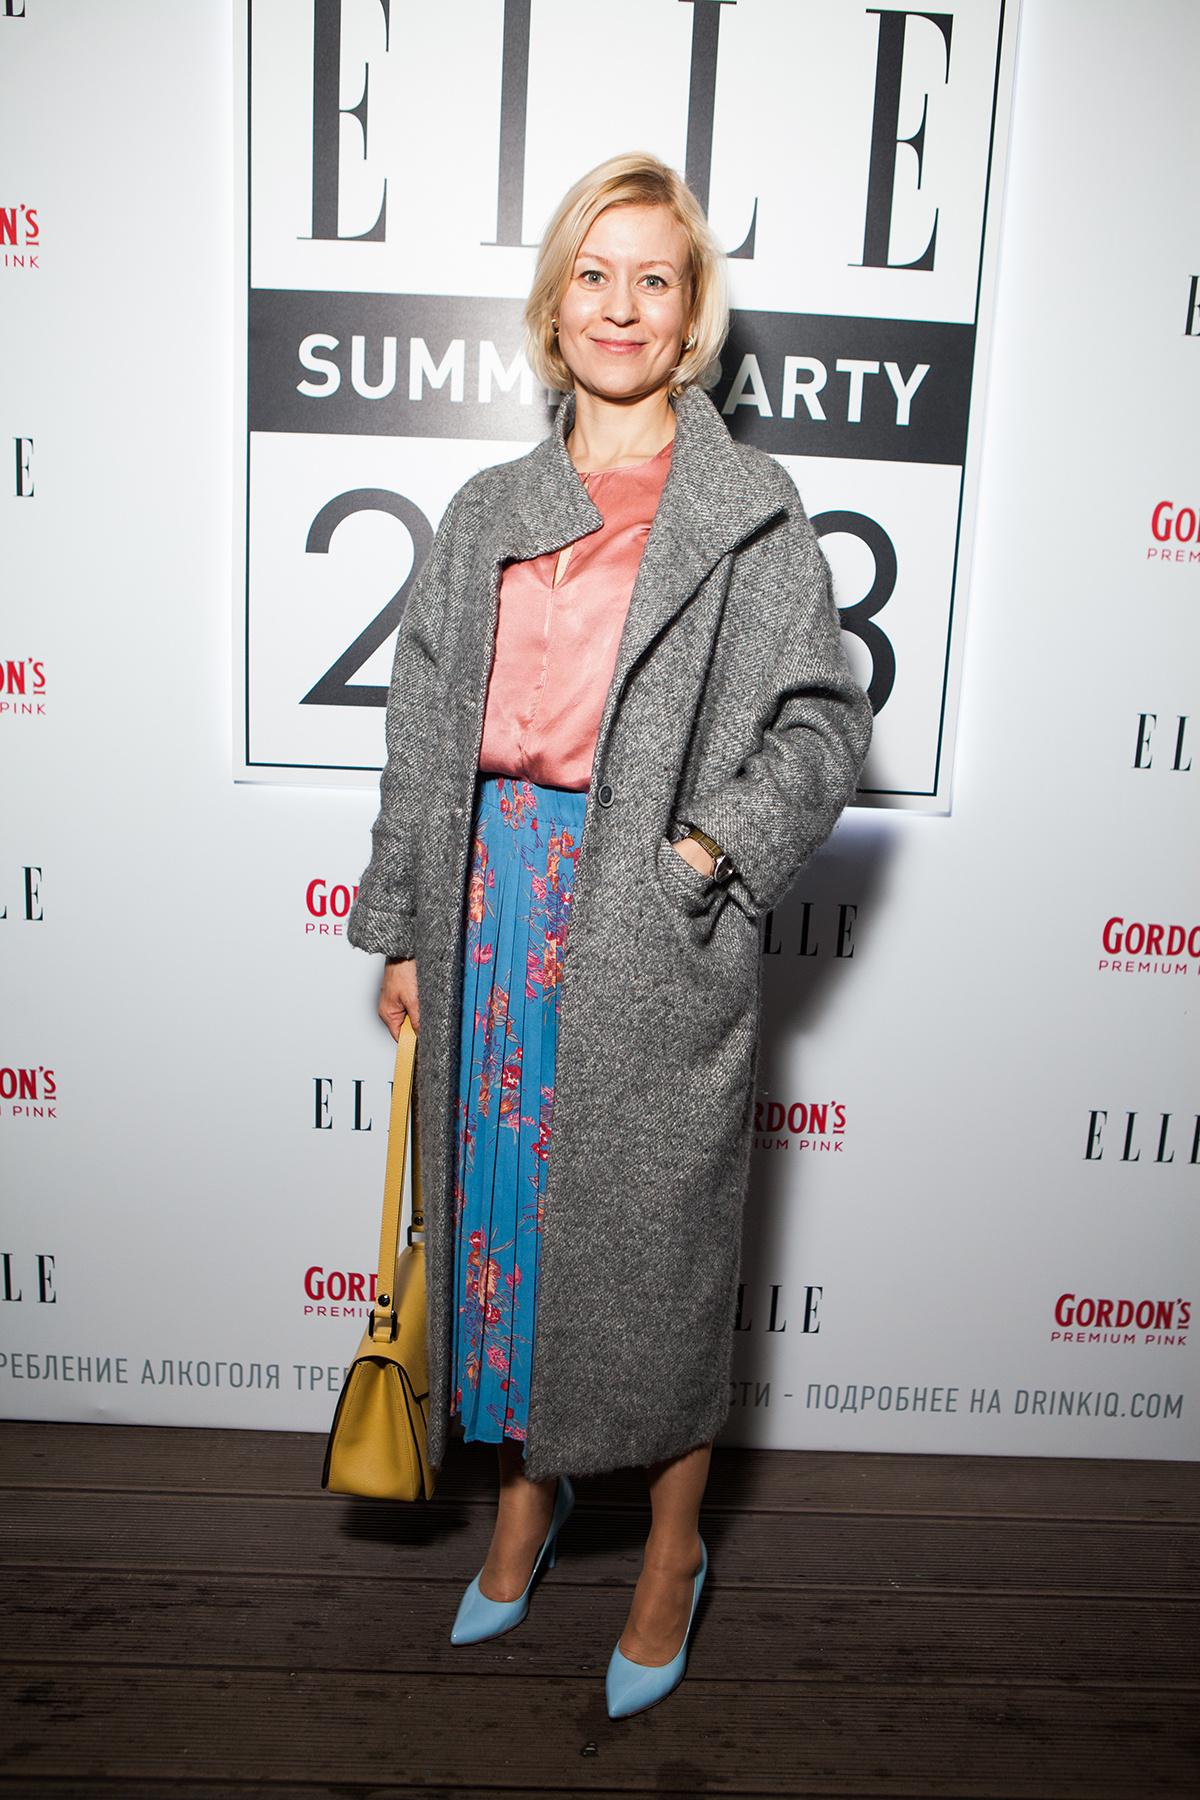 Elle Summer Party (галерея 4, фото 3)